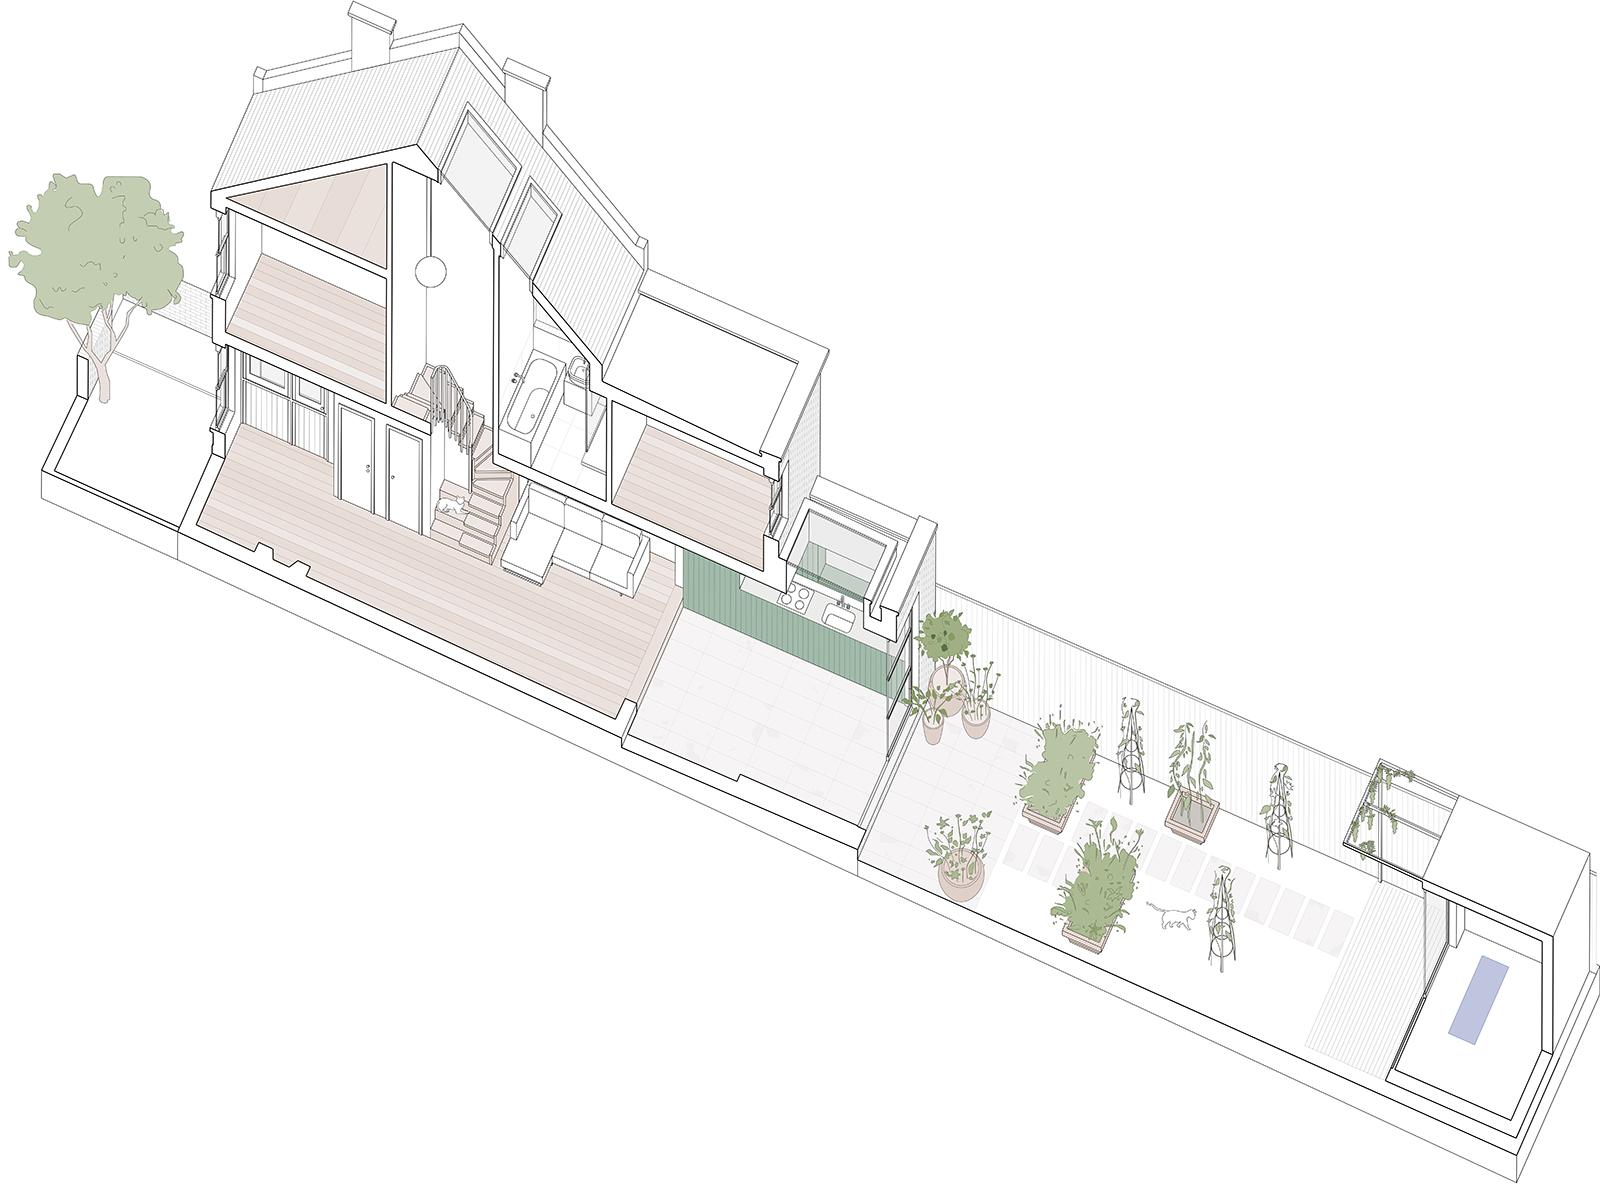 Wandsworth Cottage: axonometric drawing